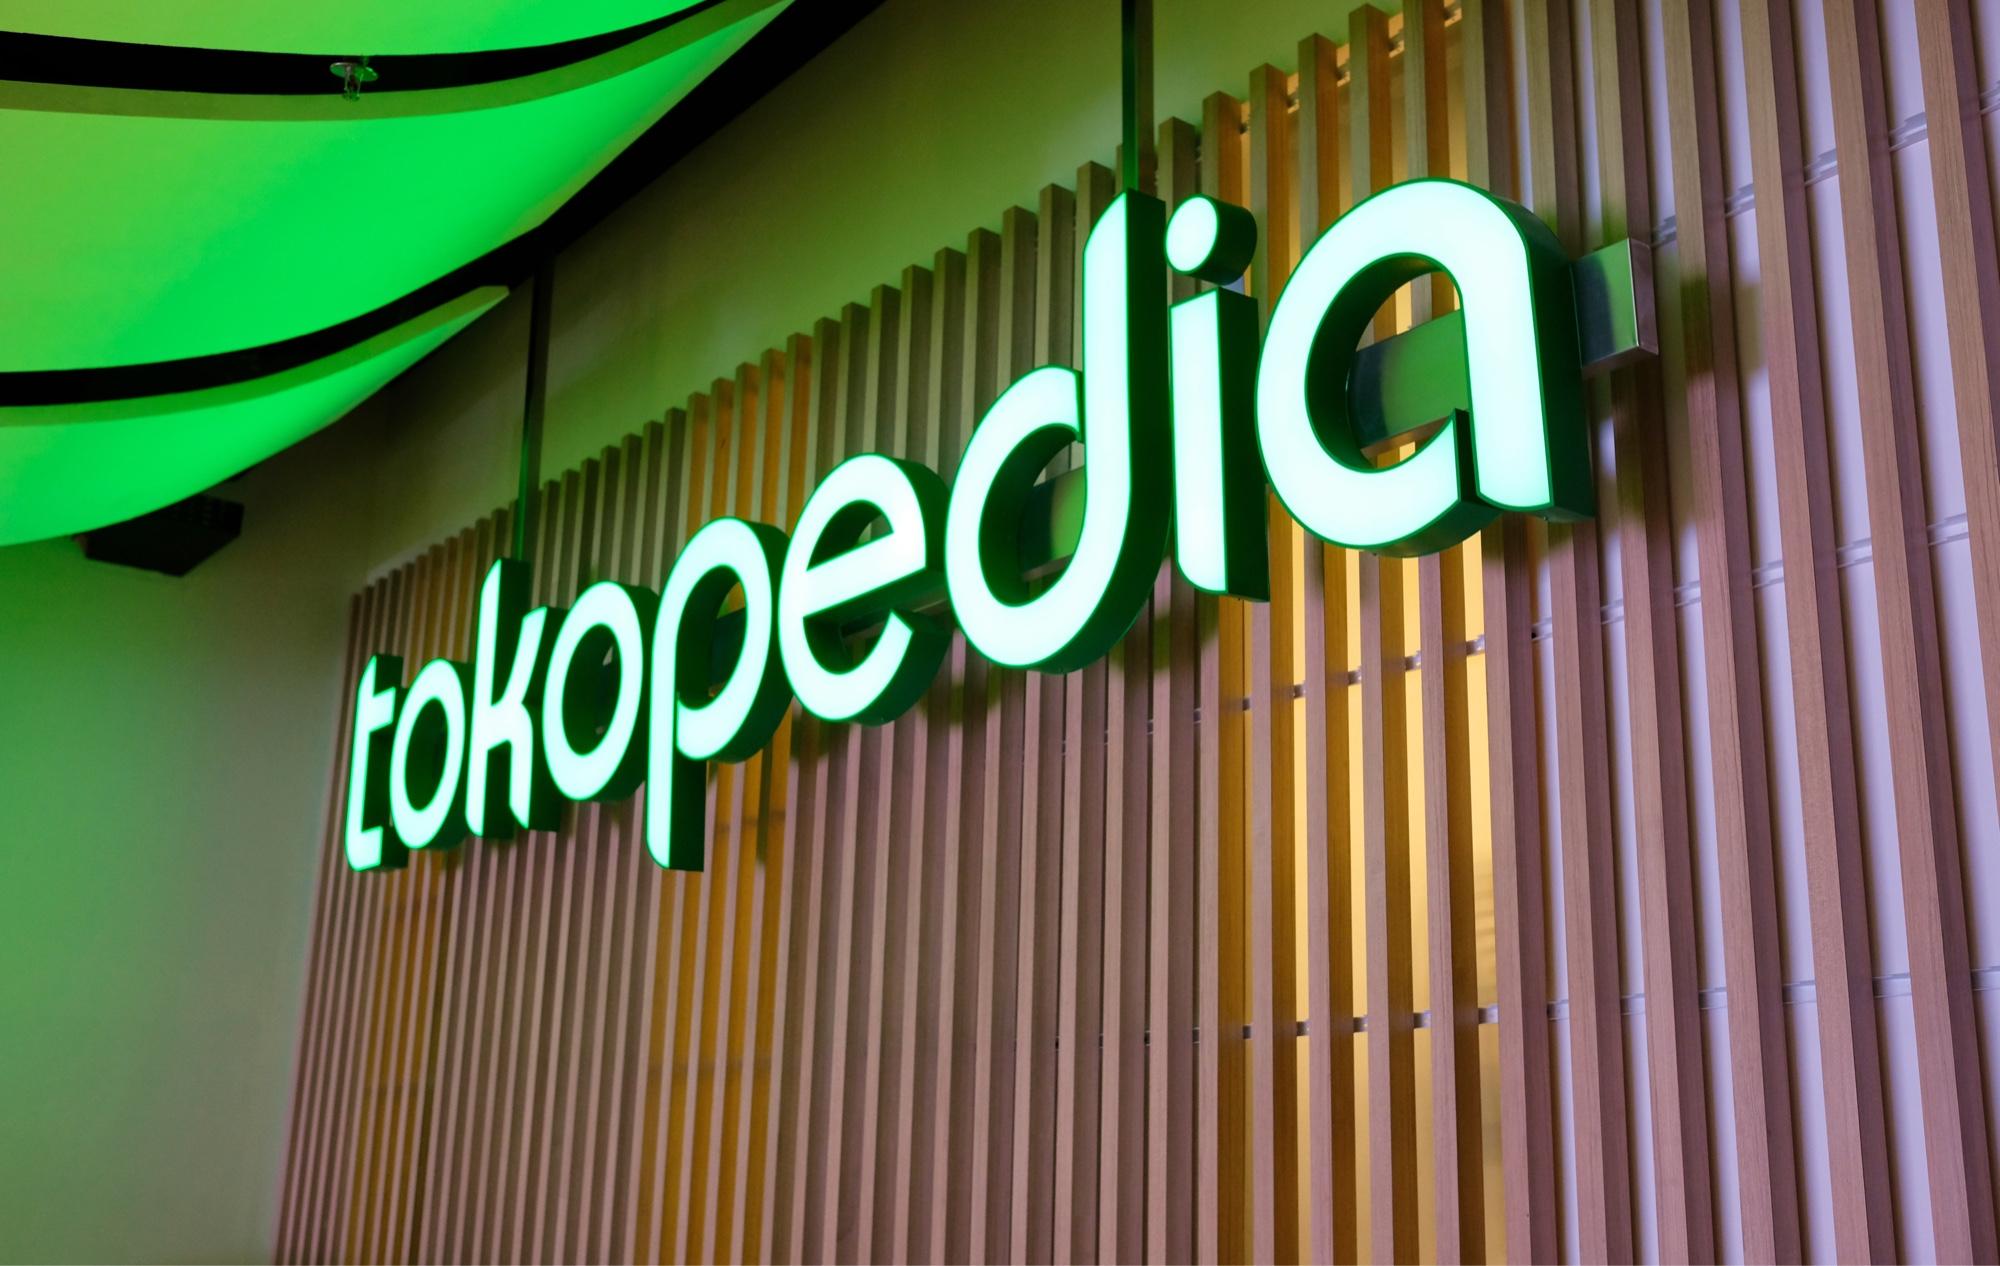 tokopedia-ilustrasi-kantor-logo